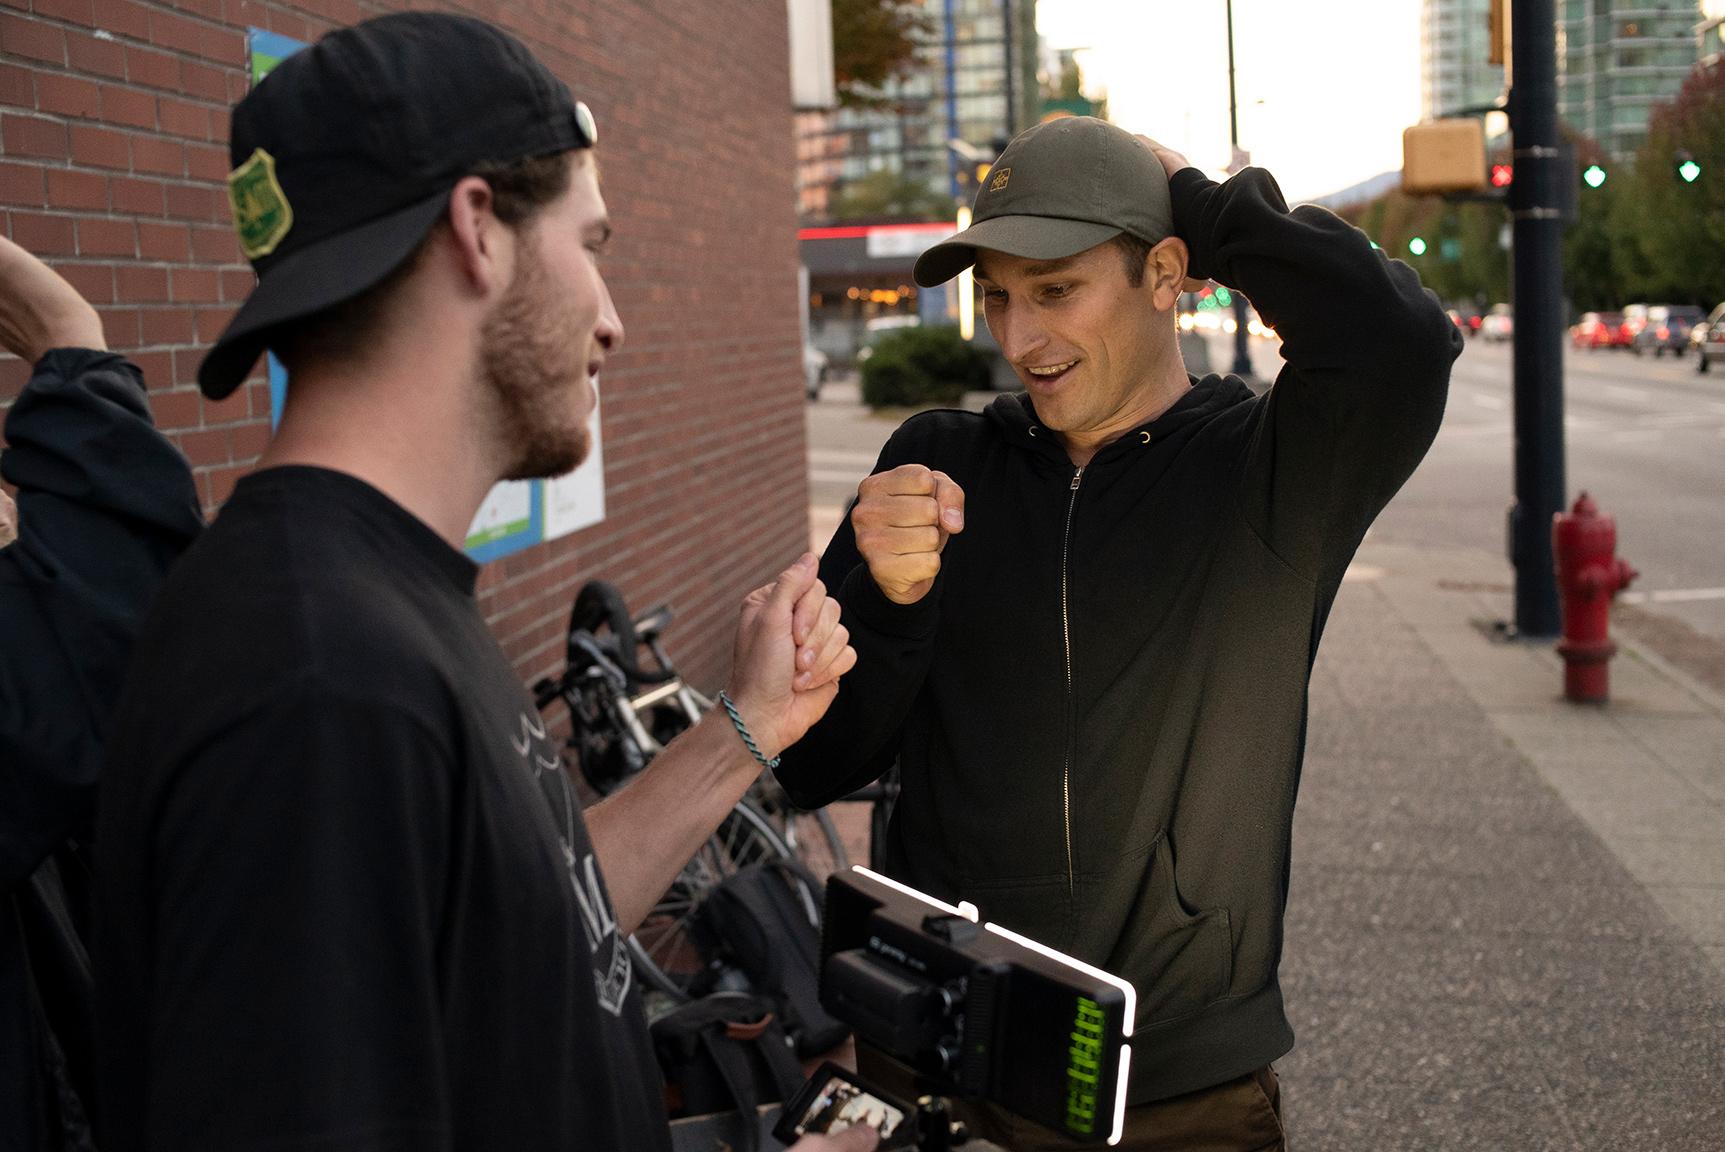 Filmer/Editor: Andrew Schubert